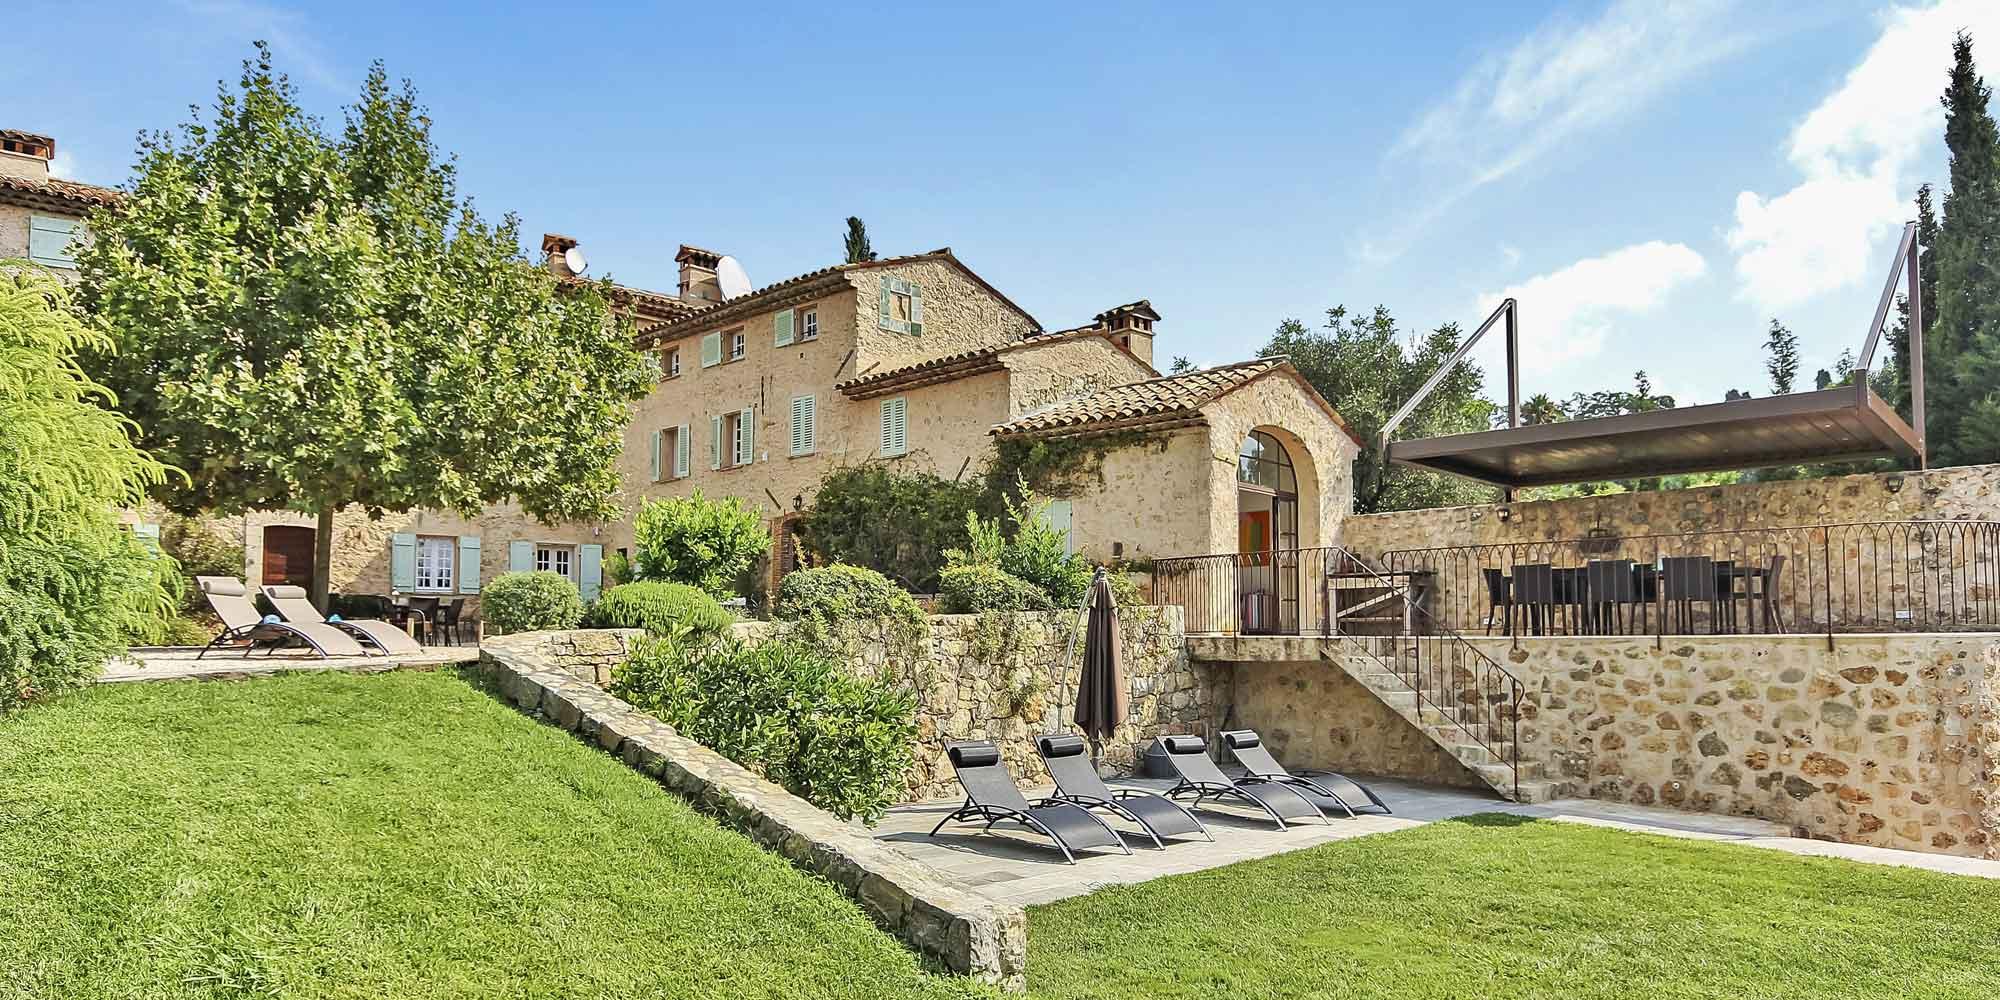 La Ferme Wedding Venue French Riviera Chateau Bee Selection